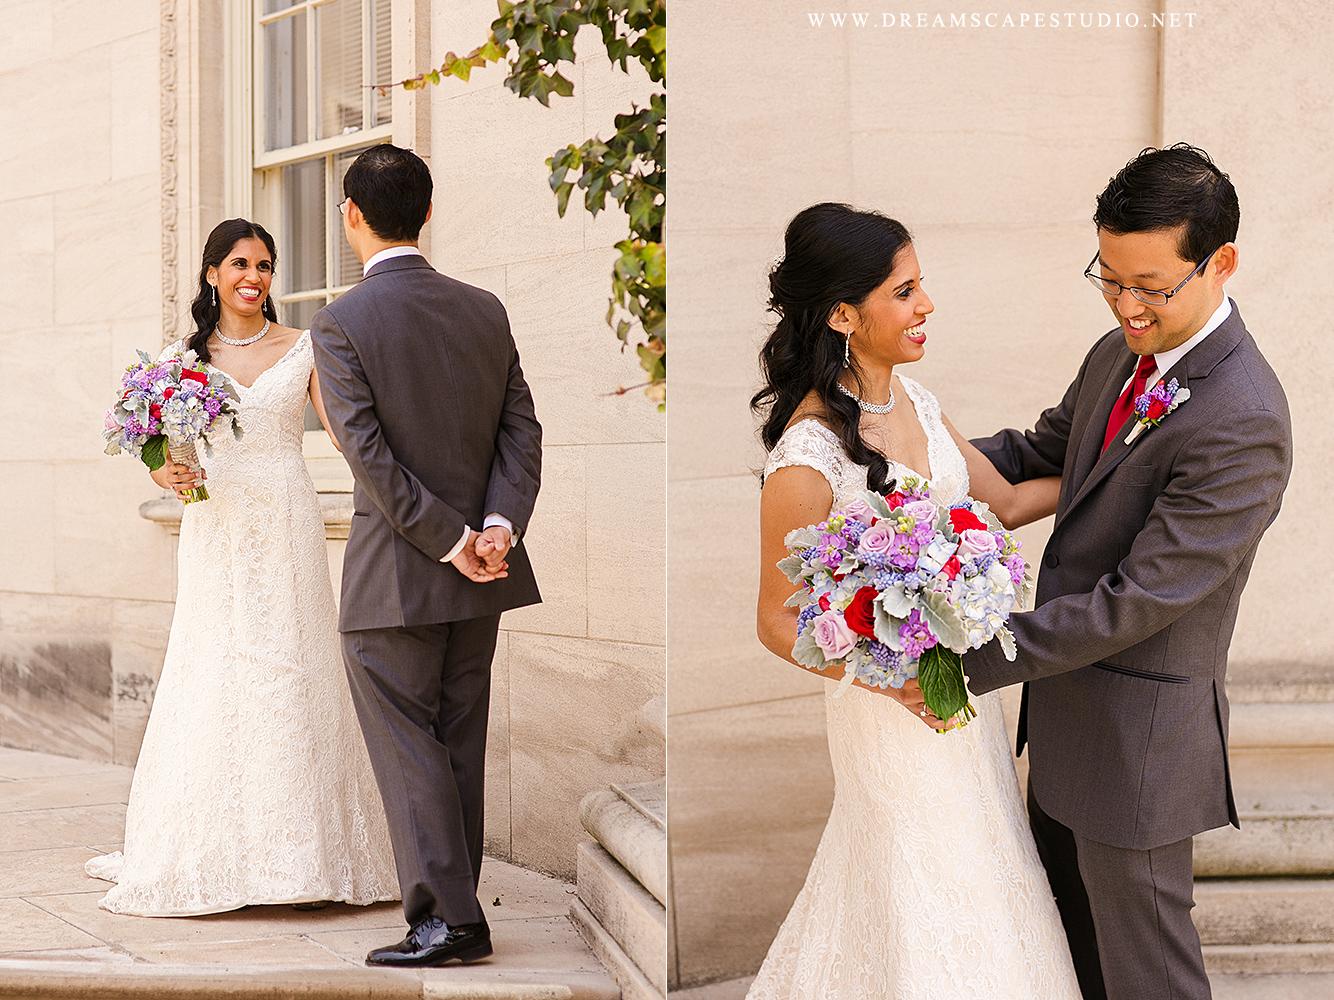 CT_Wedding_Photographer_PaHe_Blog_06.jpg